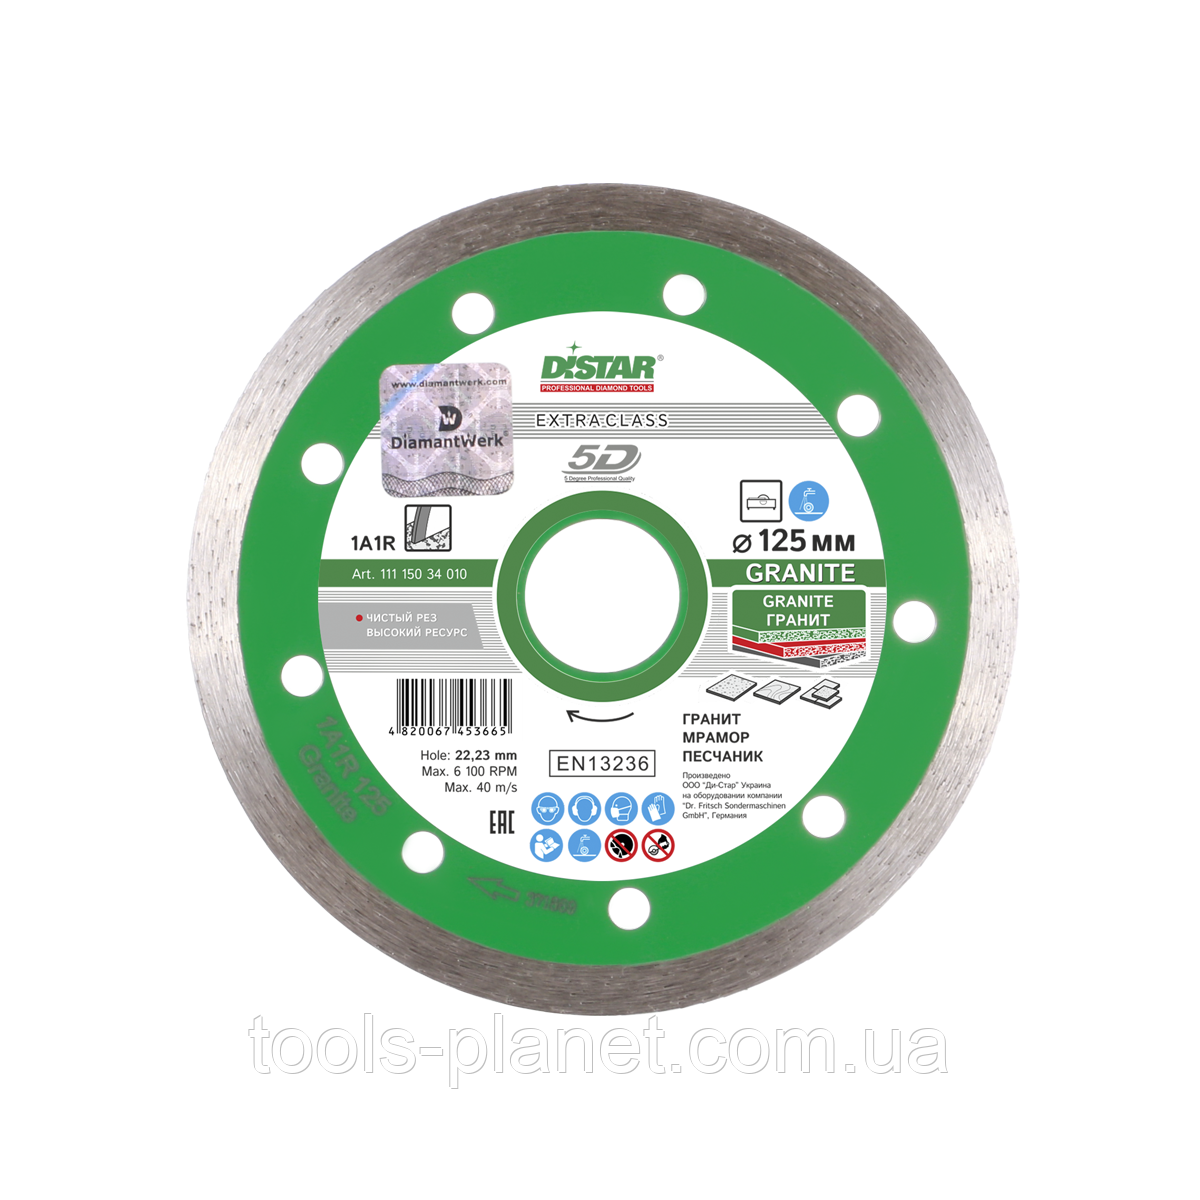 Алмазный диск Distar 1A1R 125 x 1,4 x 10 x 22,23 Granite 5D (11115034010)